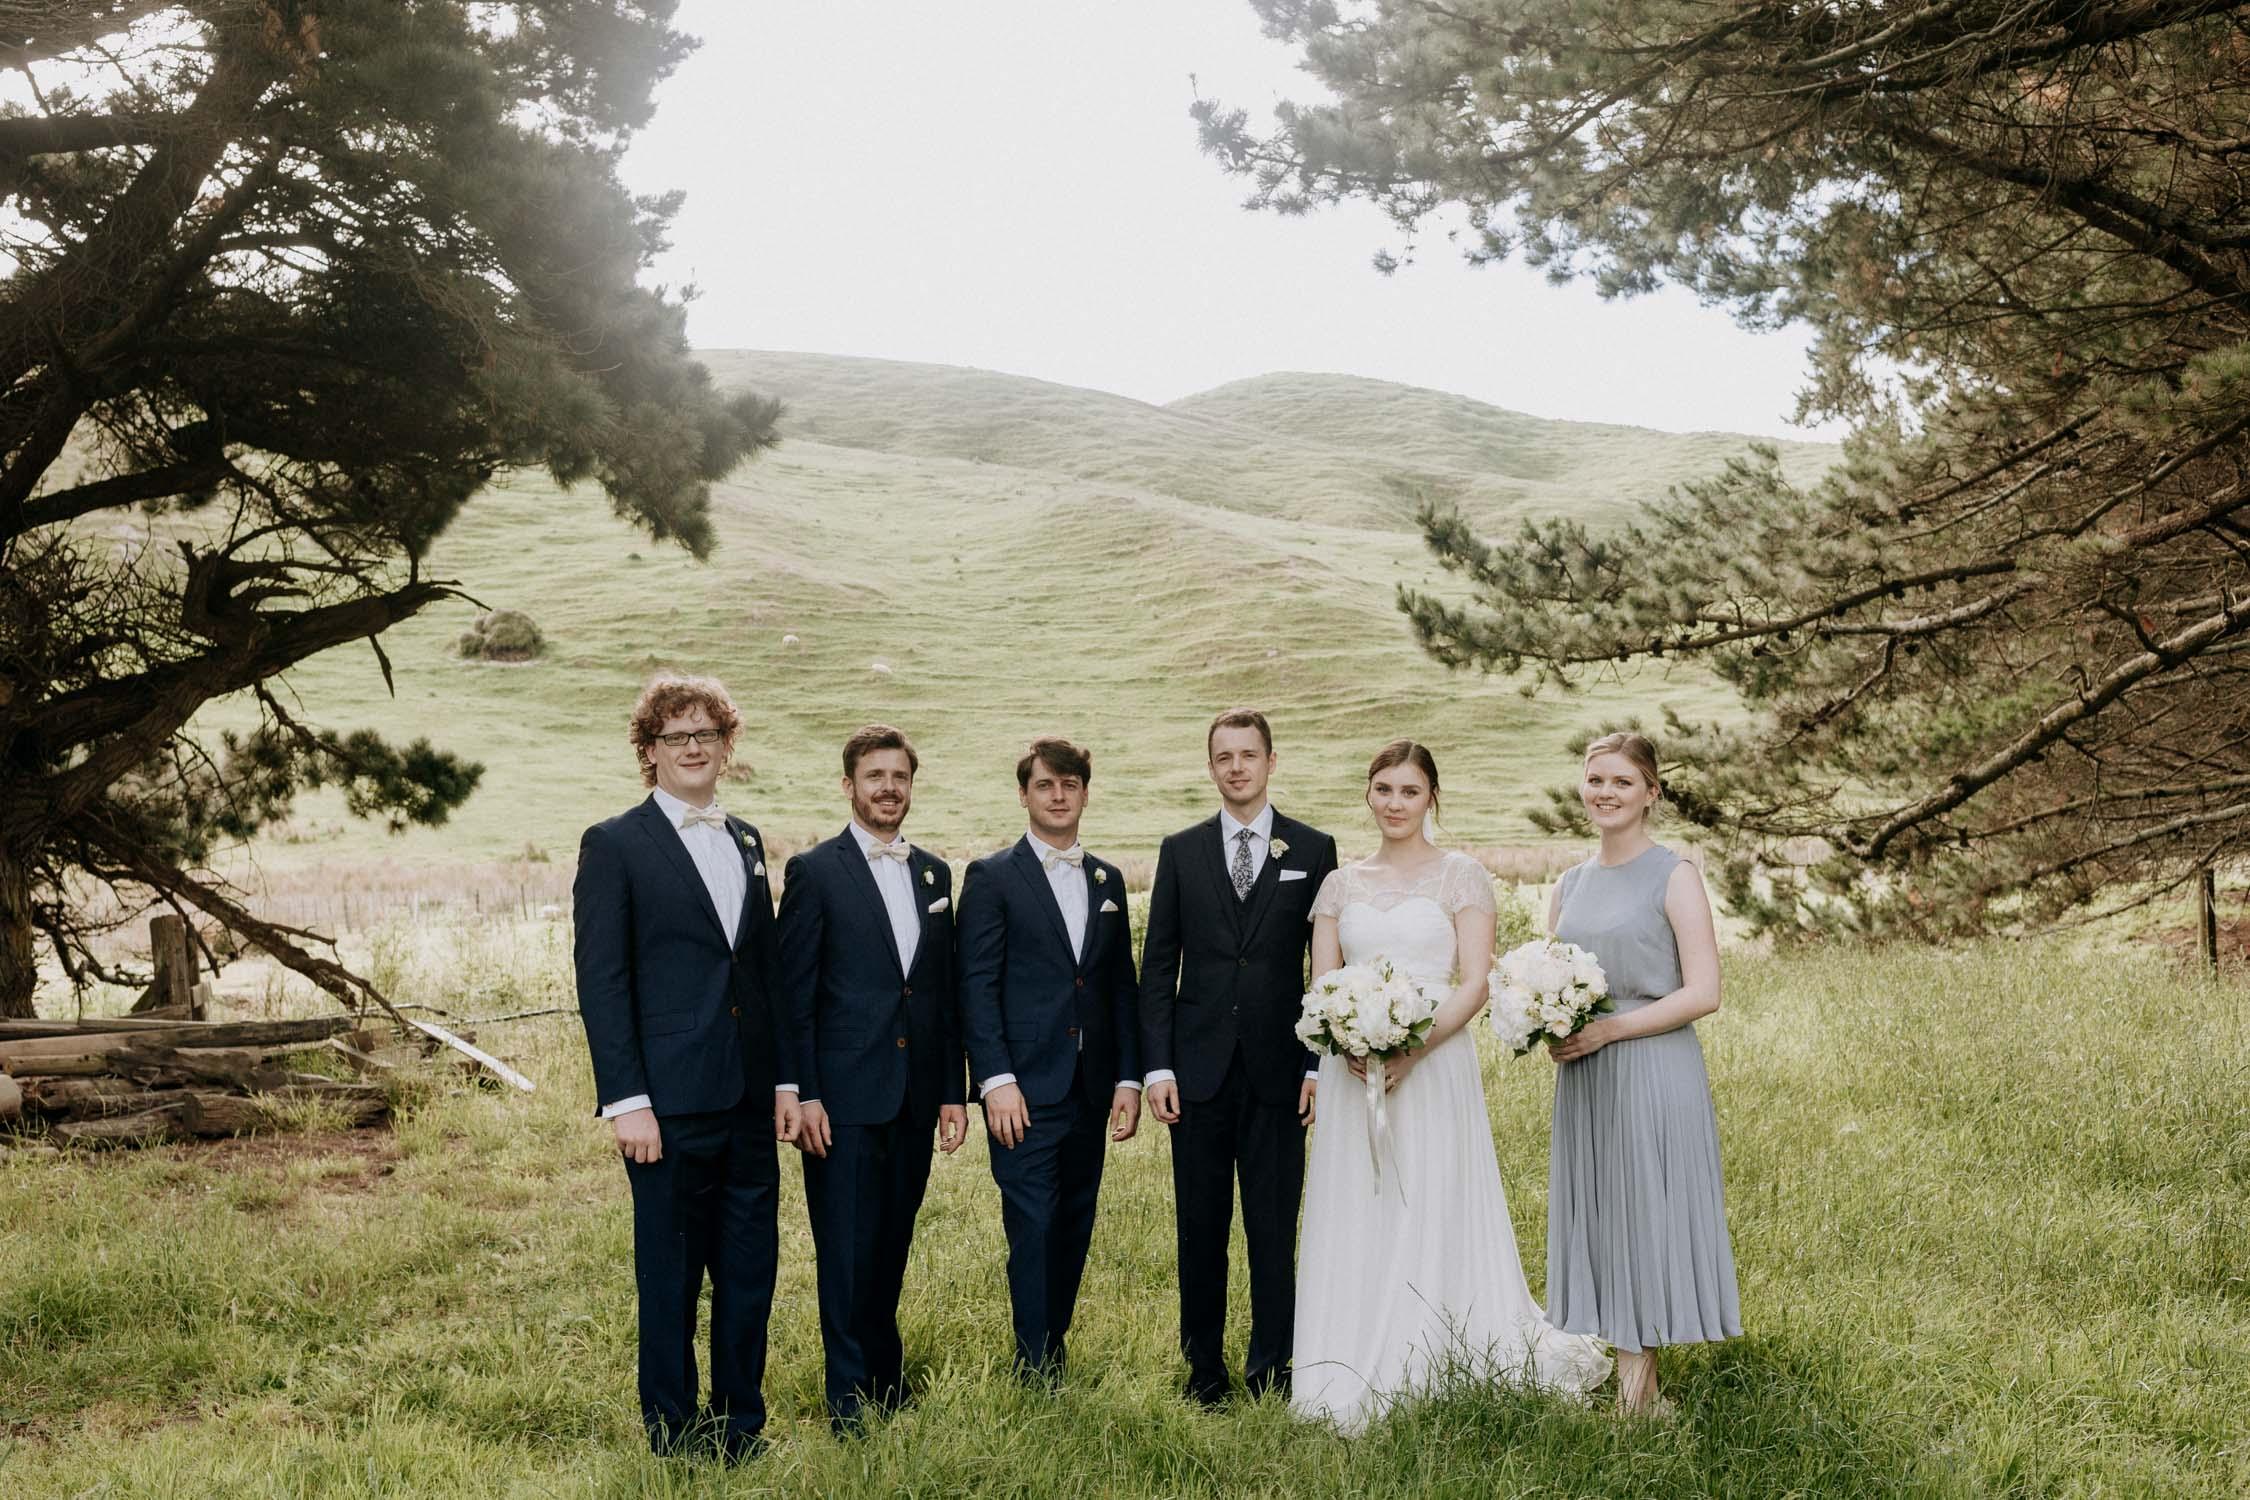 boomrock-wedding-7.jpg